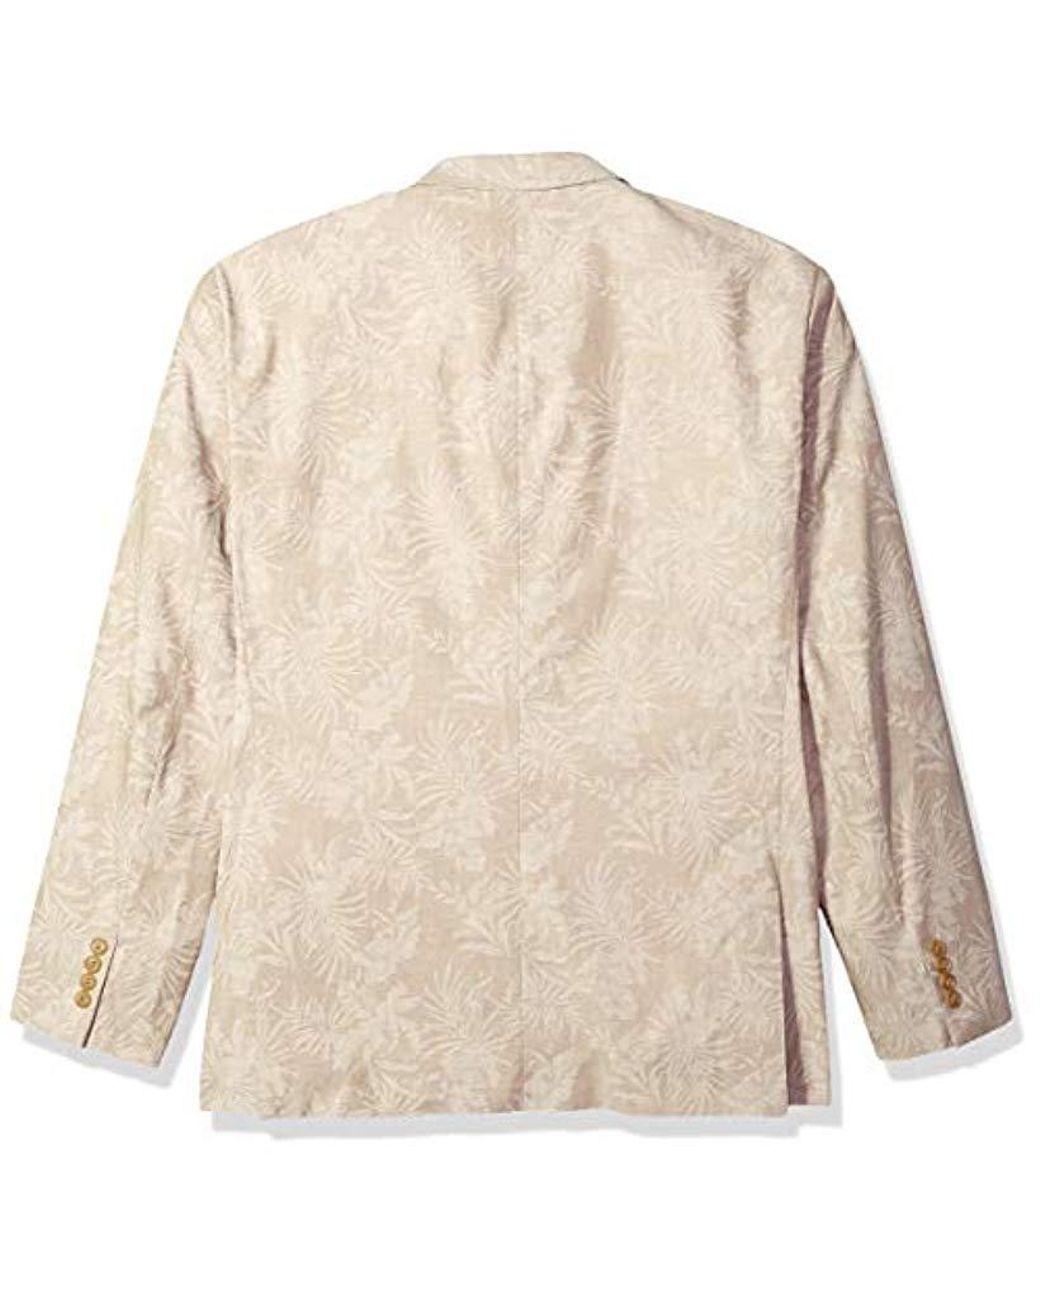 U.S Mens Big and Tall Fancy Cotton Sport Coat Sport Jacket Polo Assn